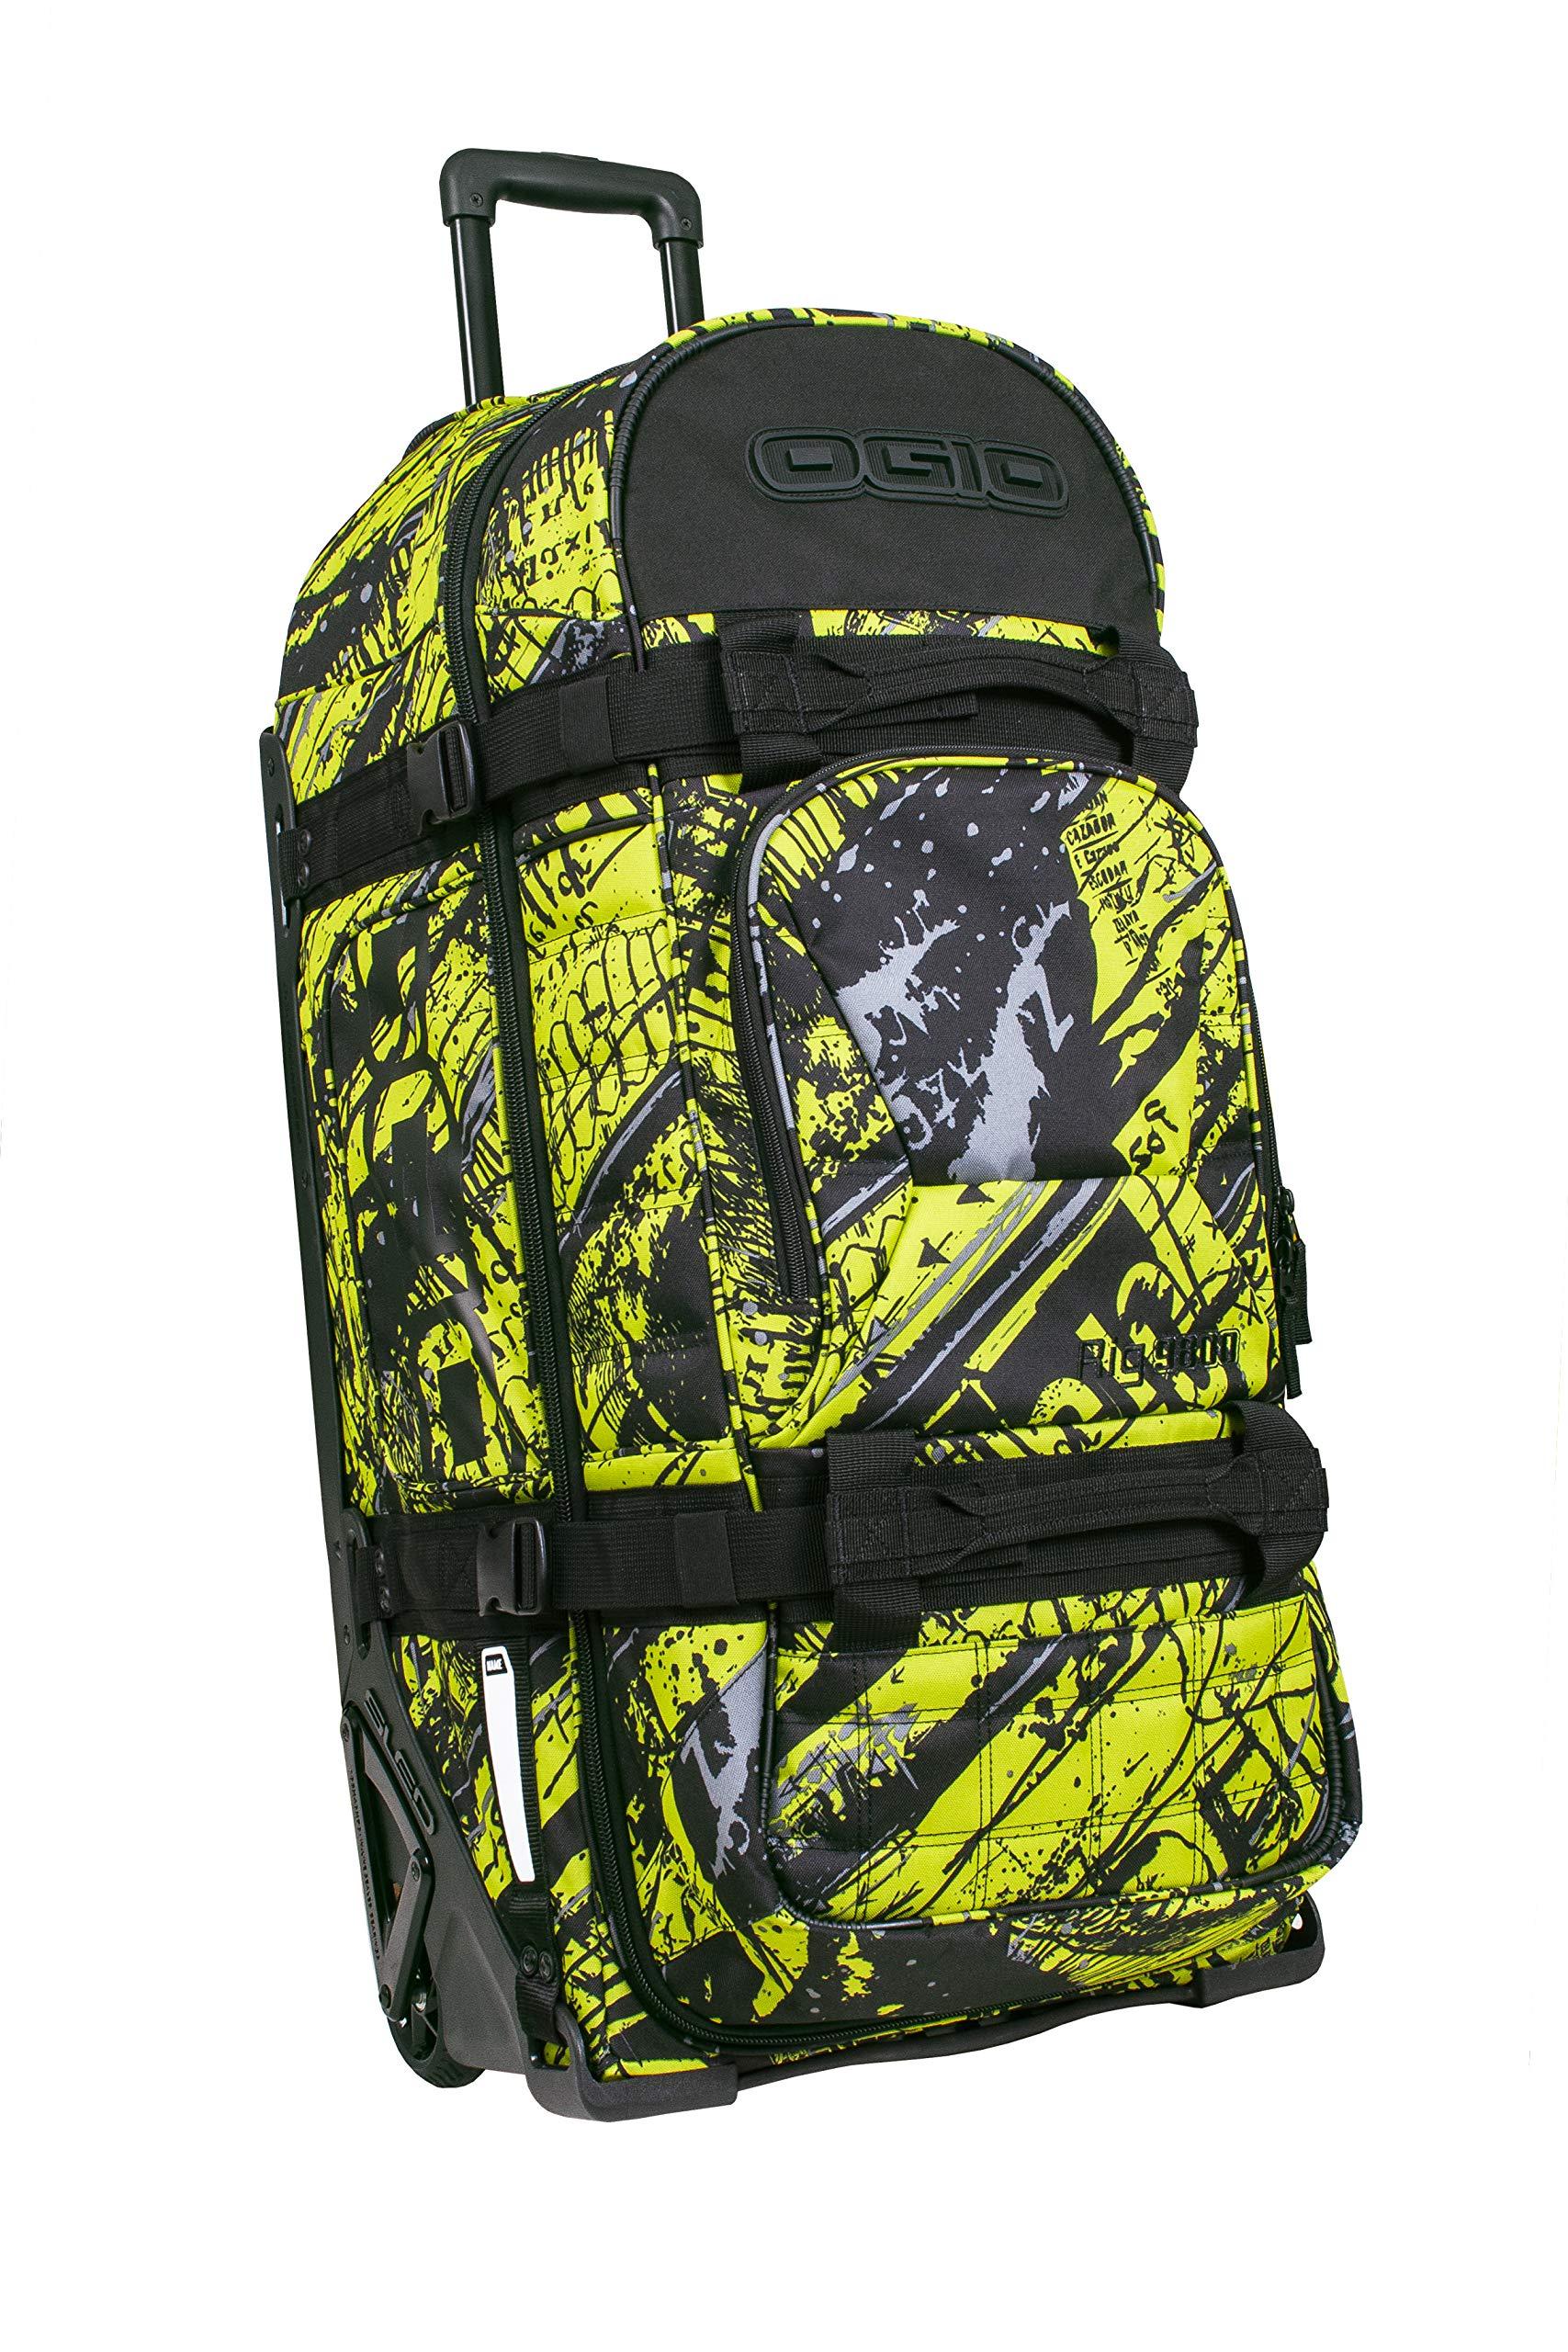 OGIO 5919322OG Black/Neon Gear Bag